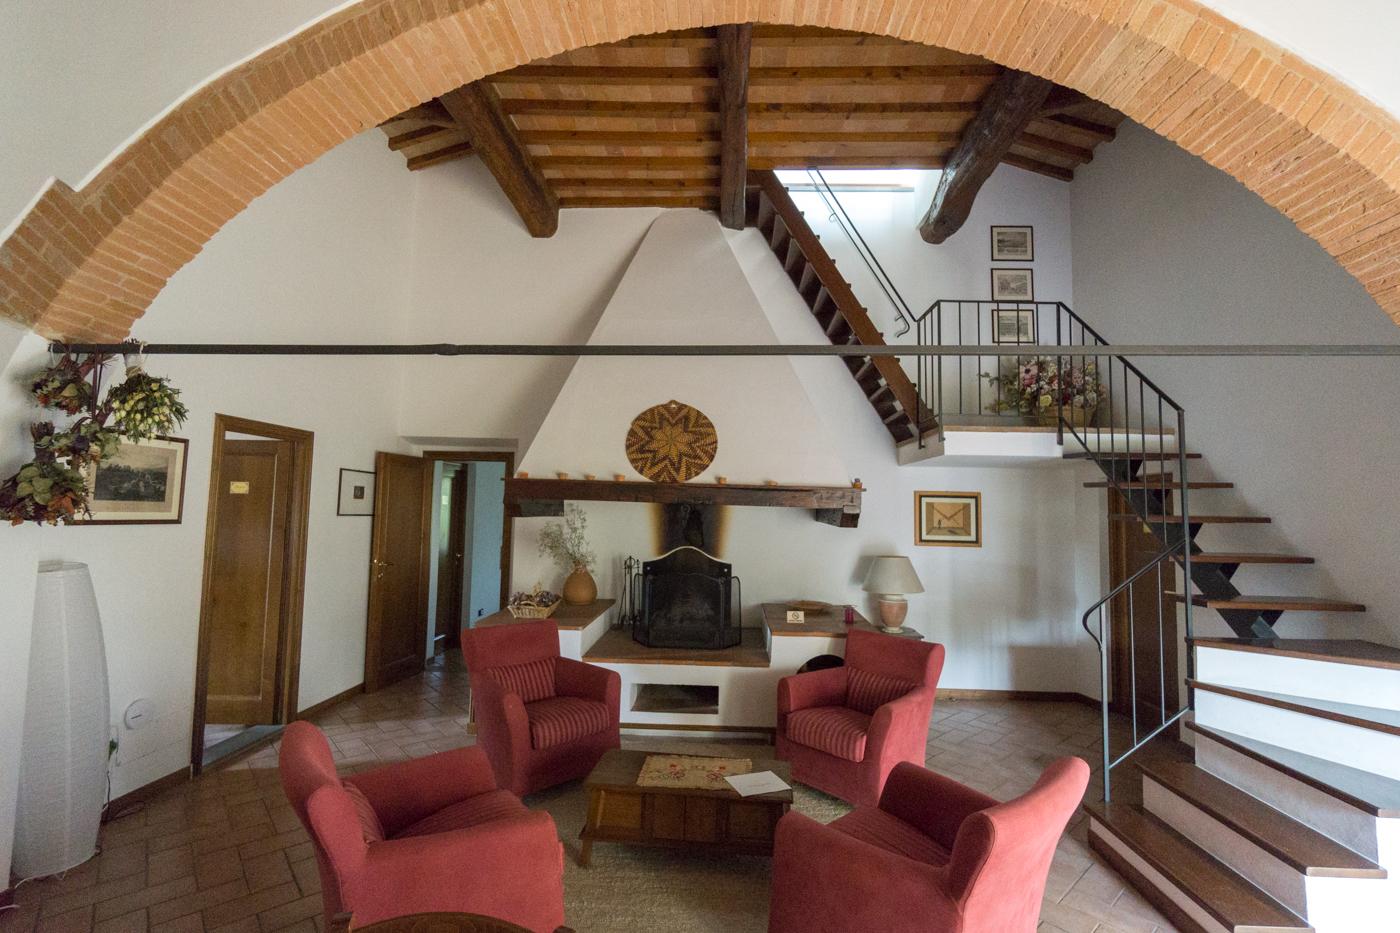 Casalta di Sotto - Où dormir à San Casciano Val di Pesa - Casalta di Sotto